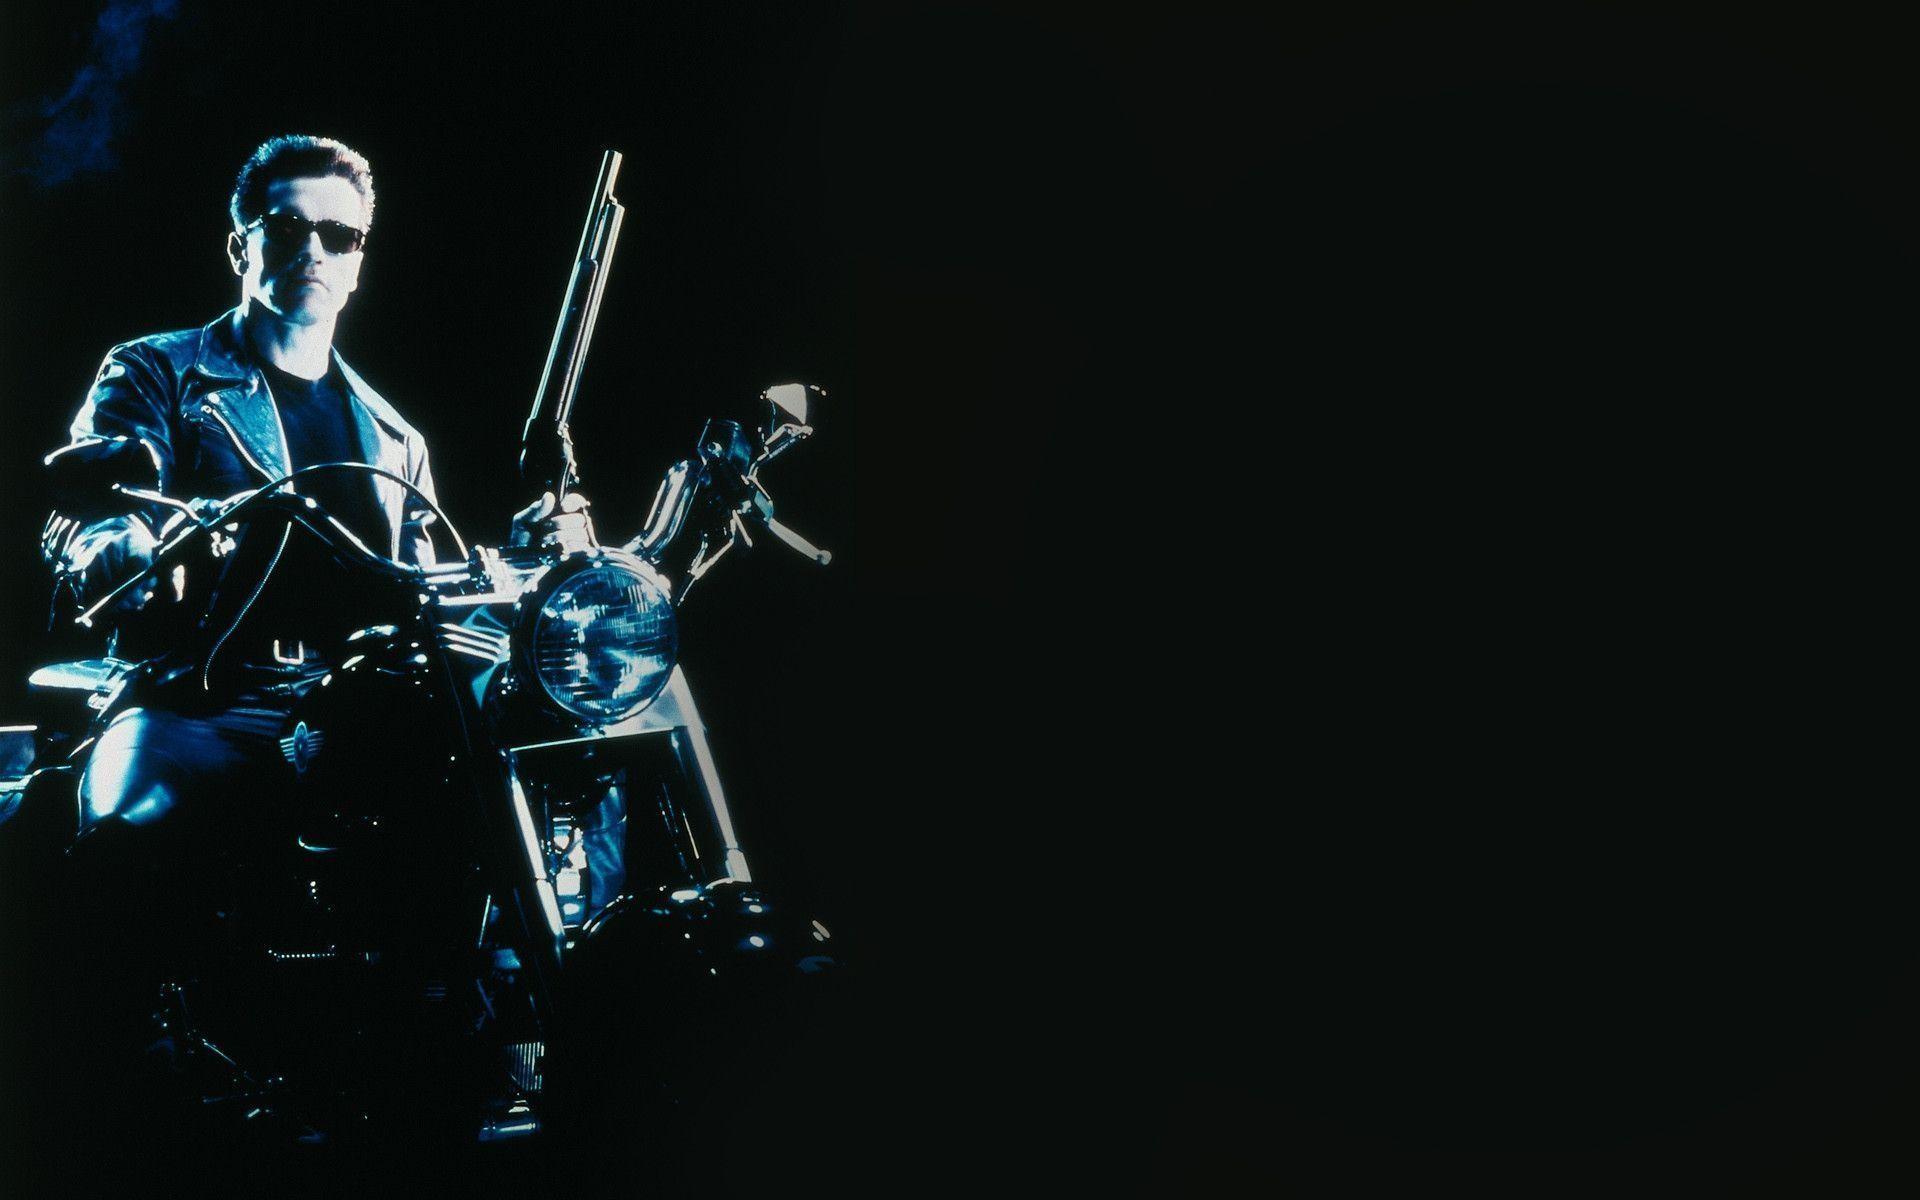 Terminator 2 wallpaper wallpapertag - Terminator 2 wallpaper hd ...